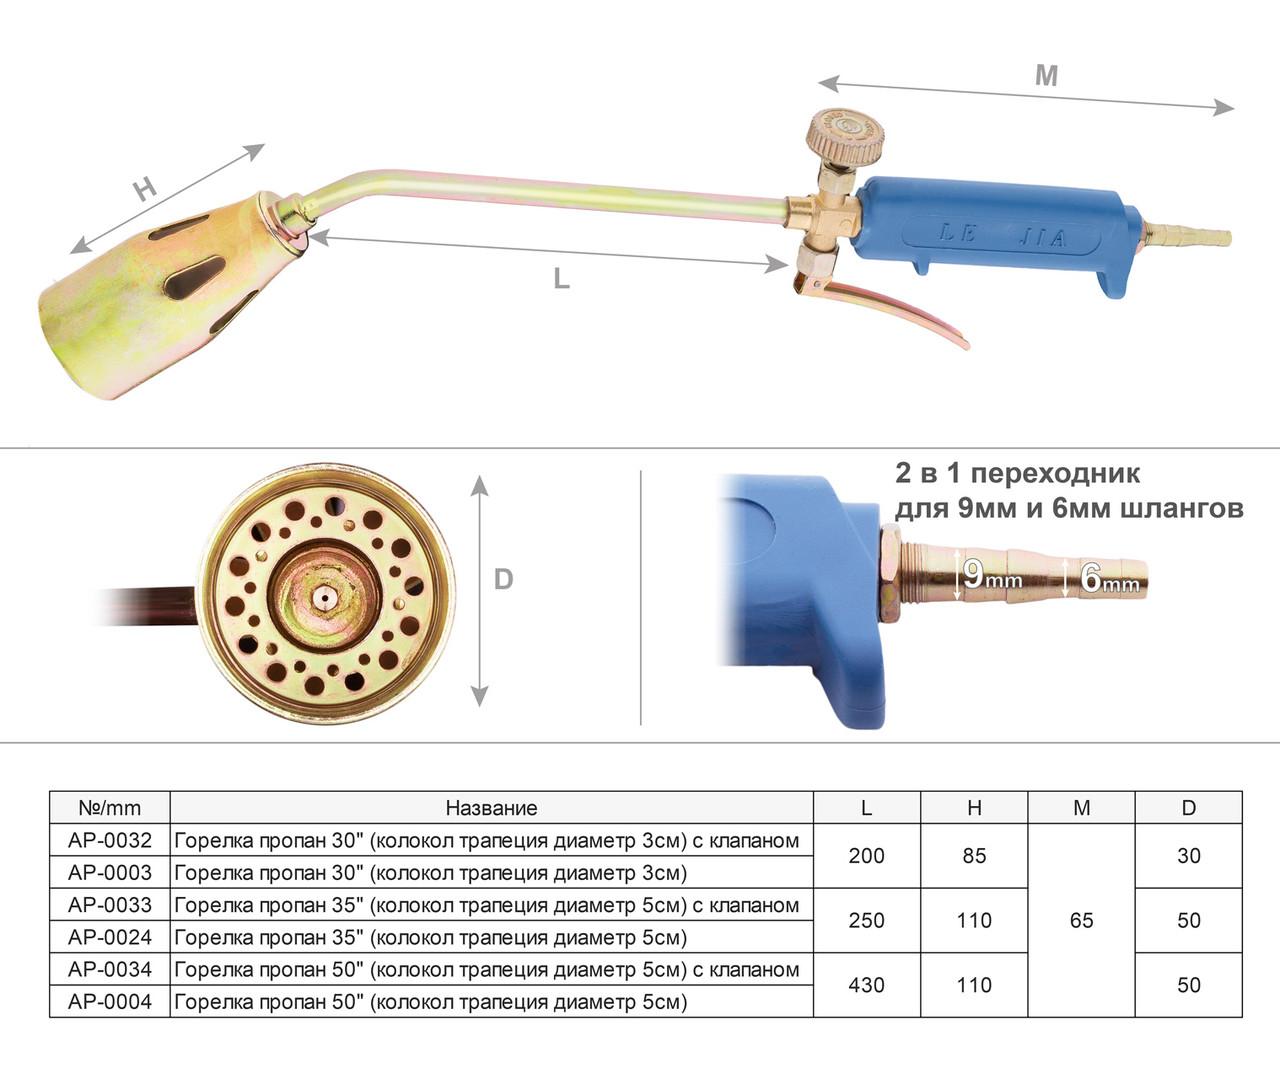 "Горелка пропан 35"" с клапаном  *колокол трапеция диаметр 5 см с клапаном*"